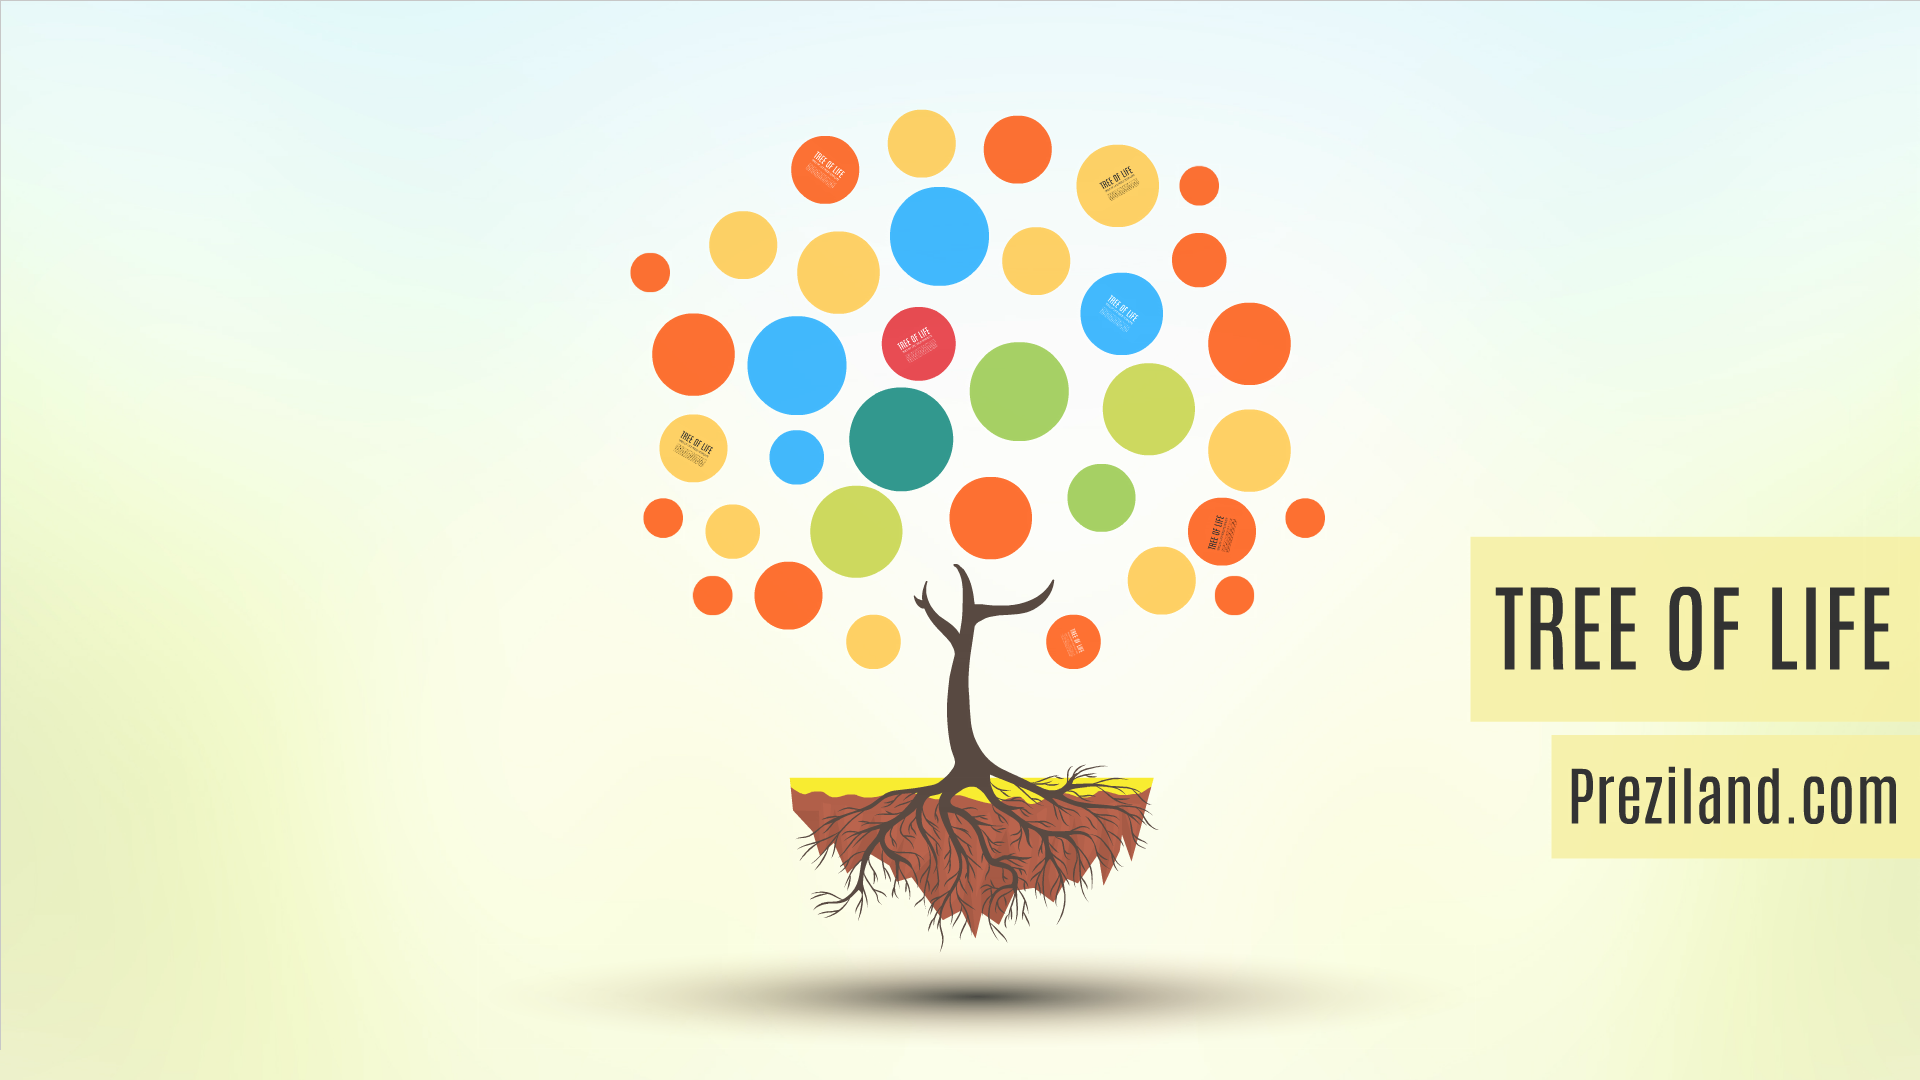 Tree of life Prezi template video